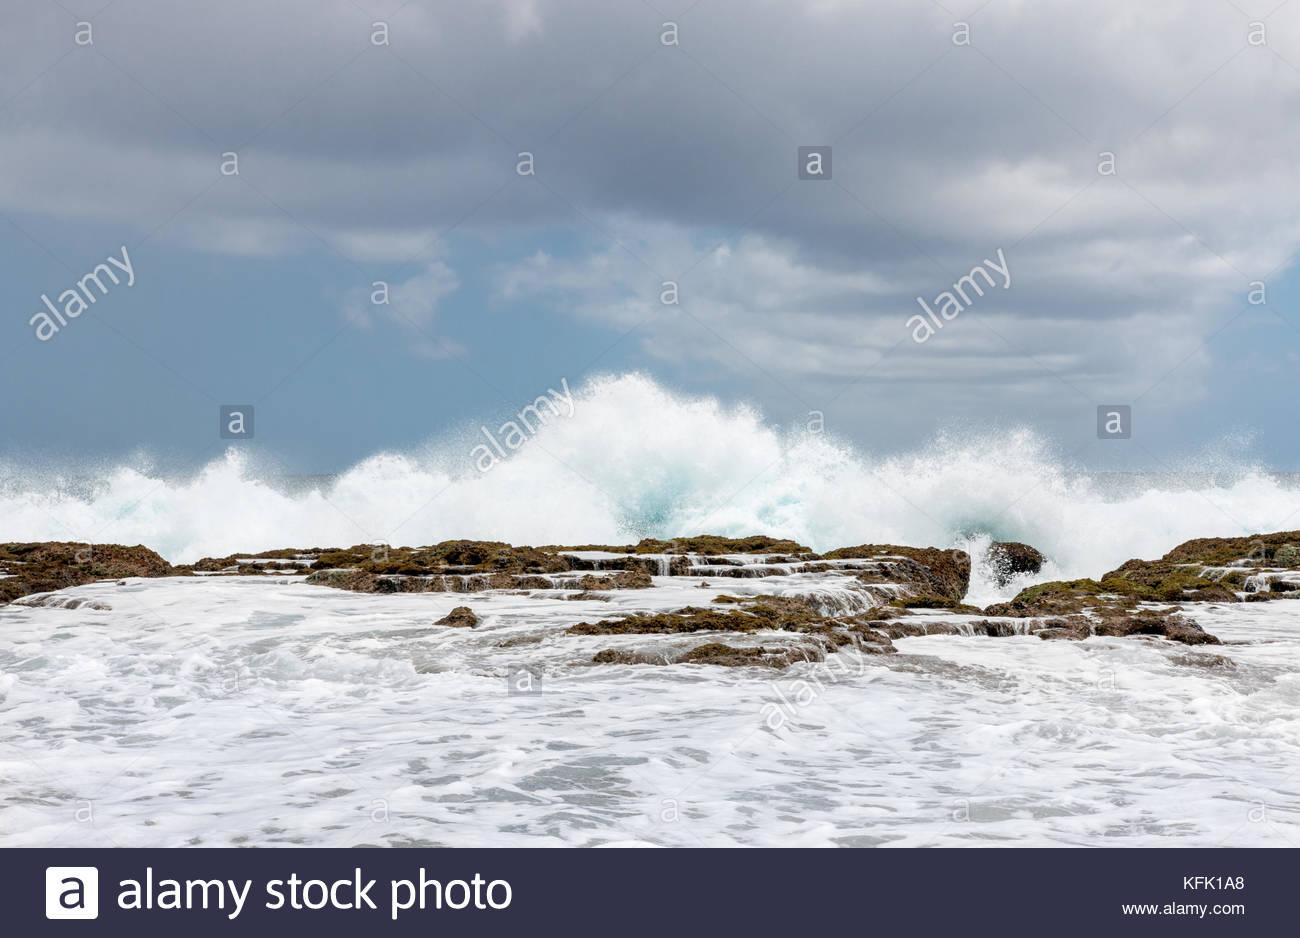 Waves crashing into the reef , Tongatapu island, Kingdom of Tonga - Stock Image